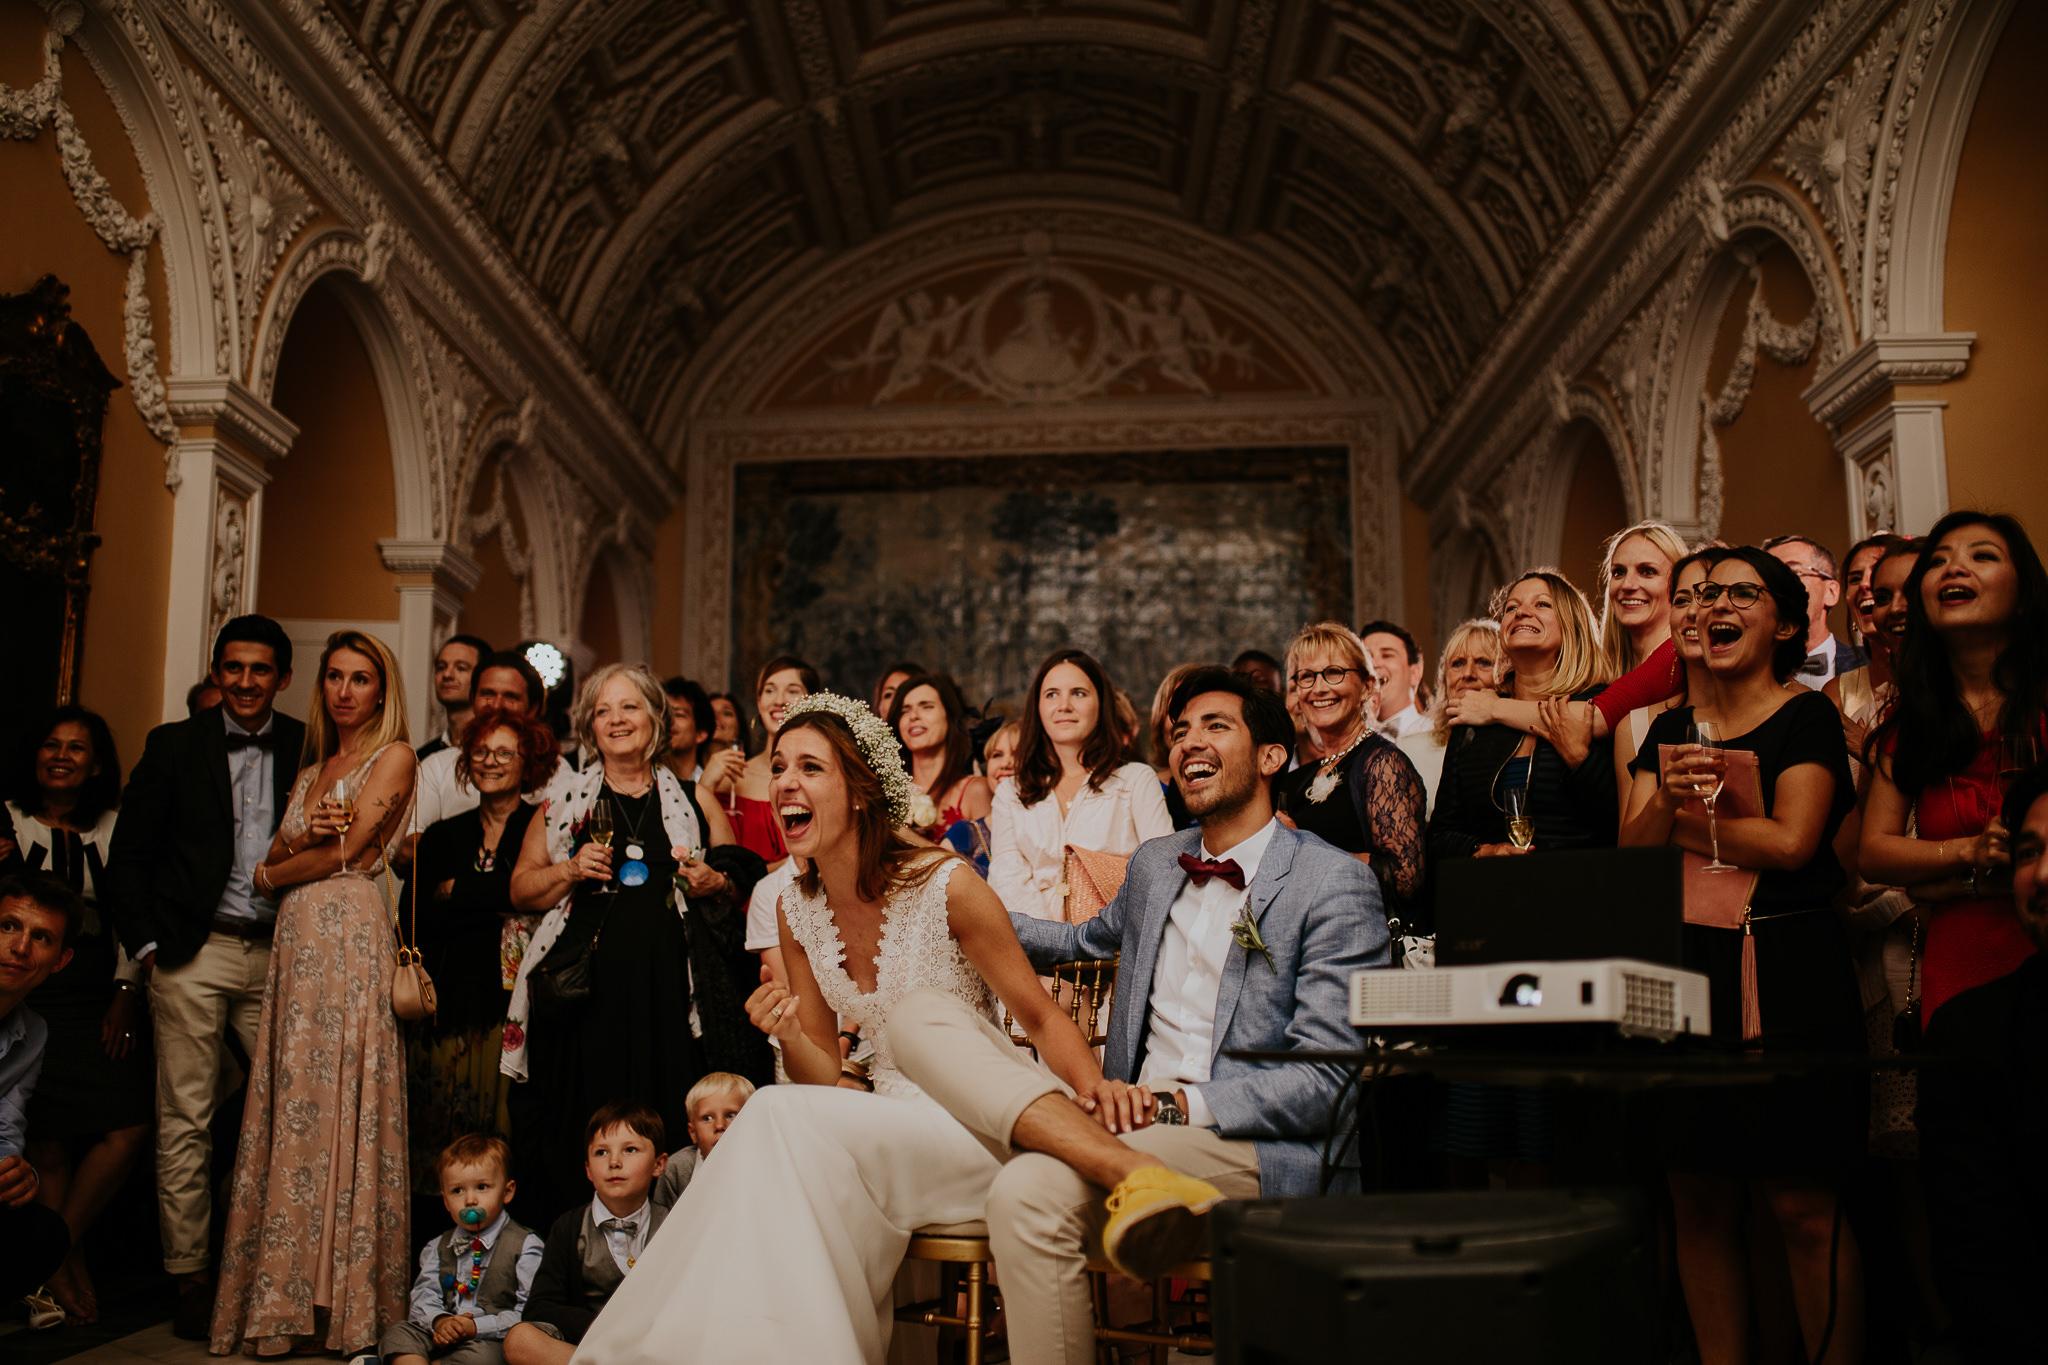 romina_thomas_destination_wedding_photography_fotografia_de_casamento_lisbon_sintra_penha_longa_resort-2